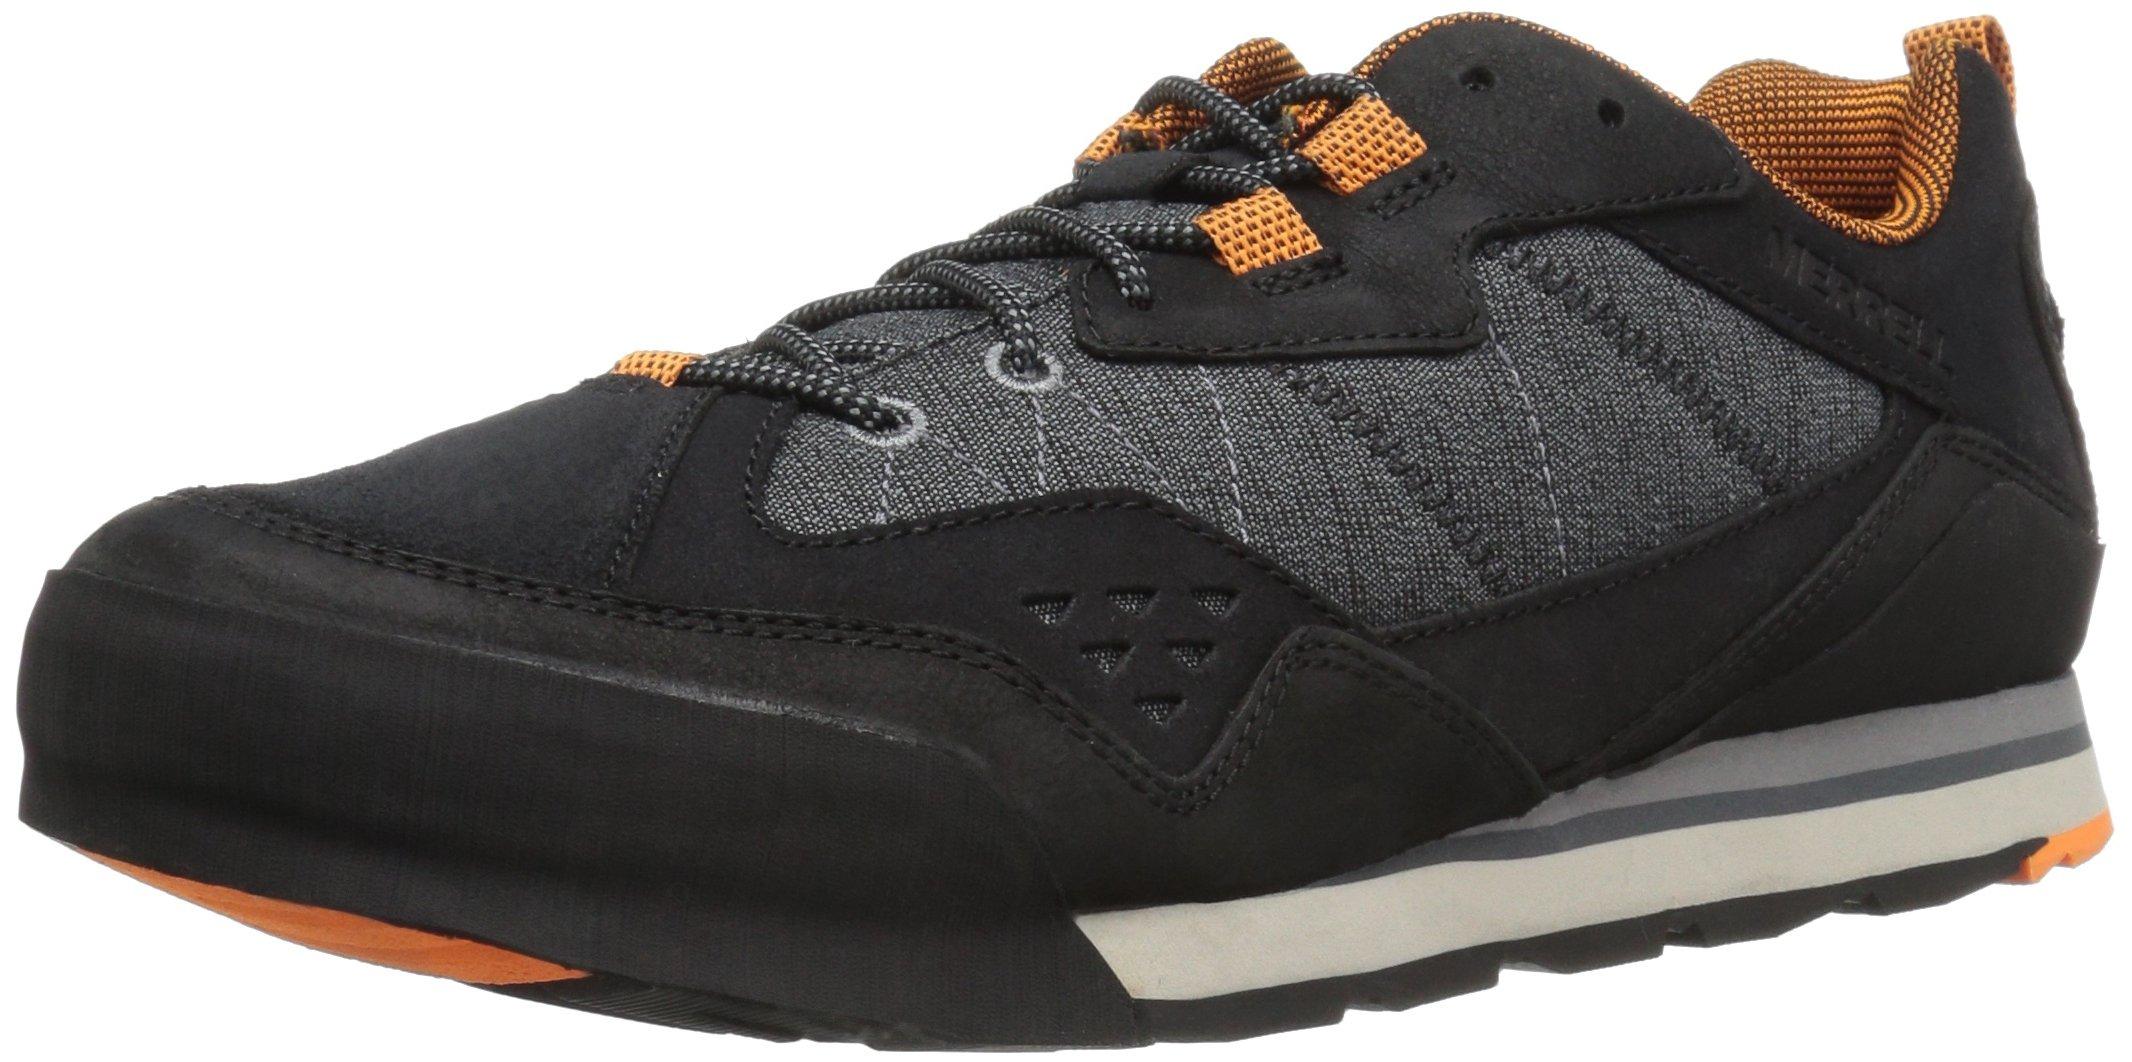 Merrell Men's Burnt Rock Fashion Sneaker, Black, 11.5 M US